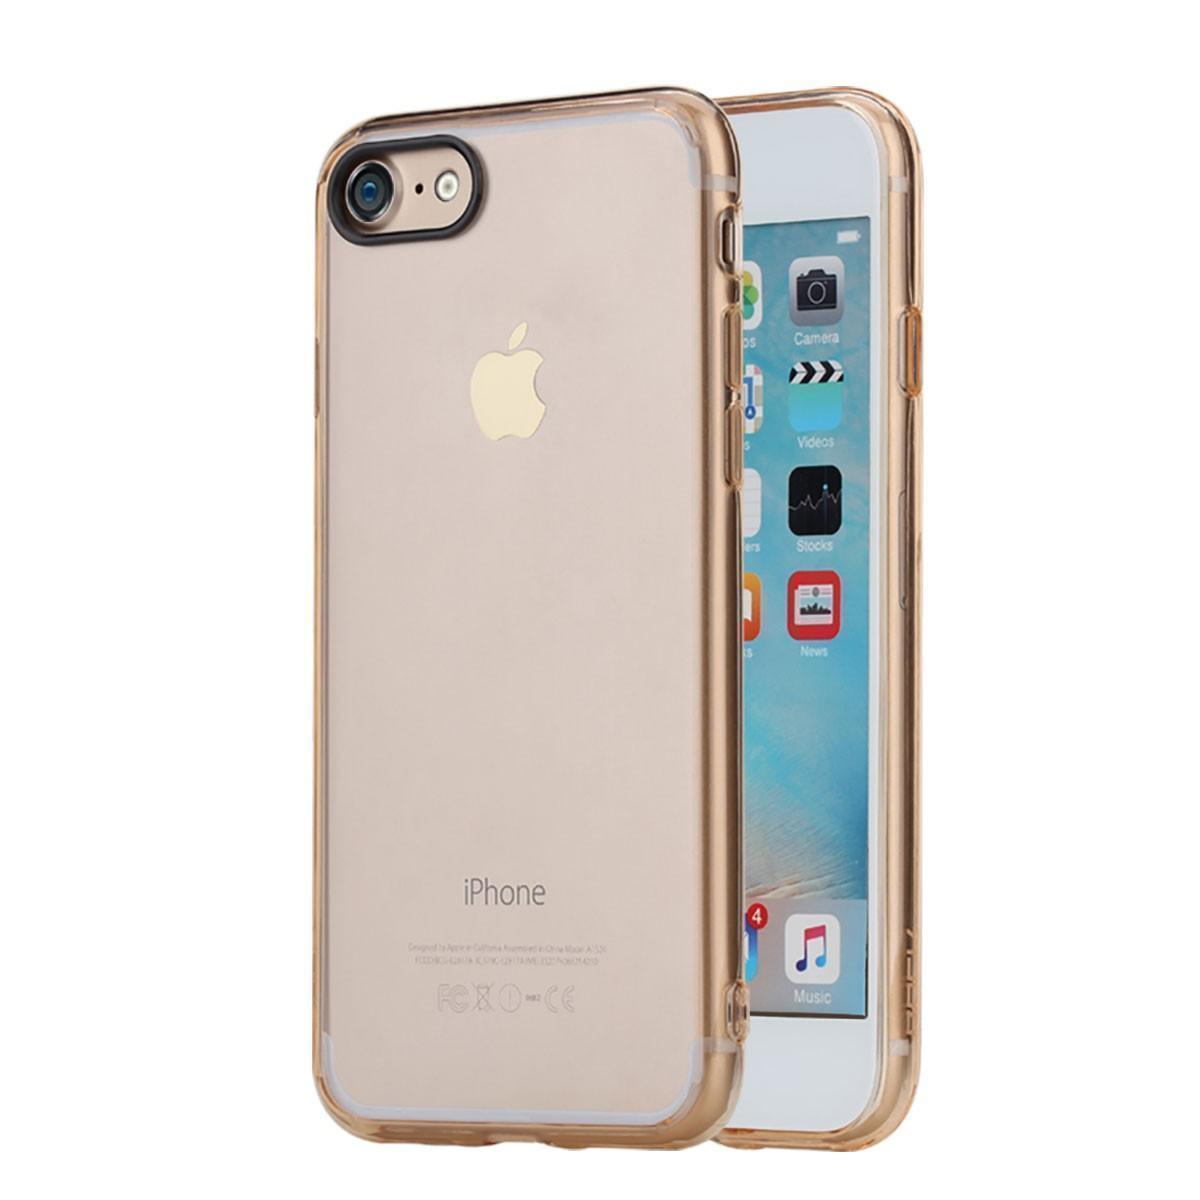 Чехол-накладка Rock Pure Series для Apple iPhone 7/8 пластик-силикон прозрачно-золотойдля iPhone 7/8<br>Чехол-накладка Rock Pure Series для Apple iPhone 7/8 пластик-силикон прозрачно-золотой<br>